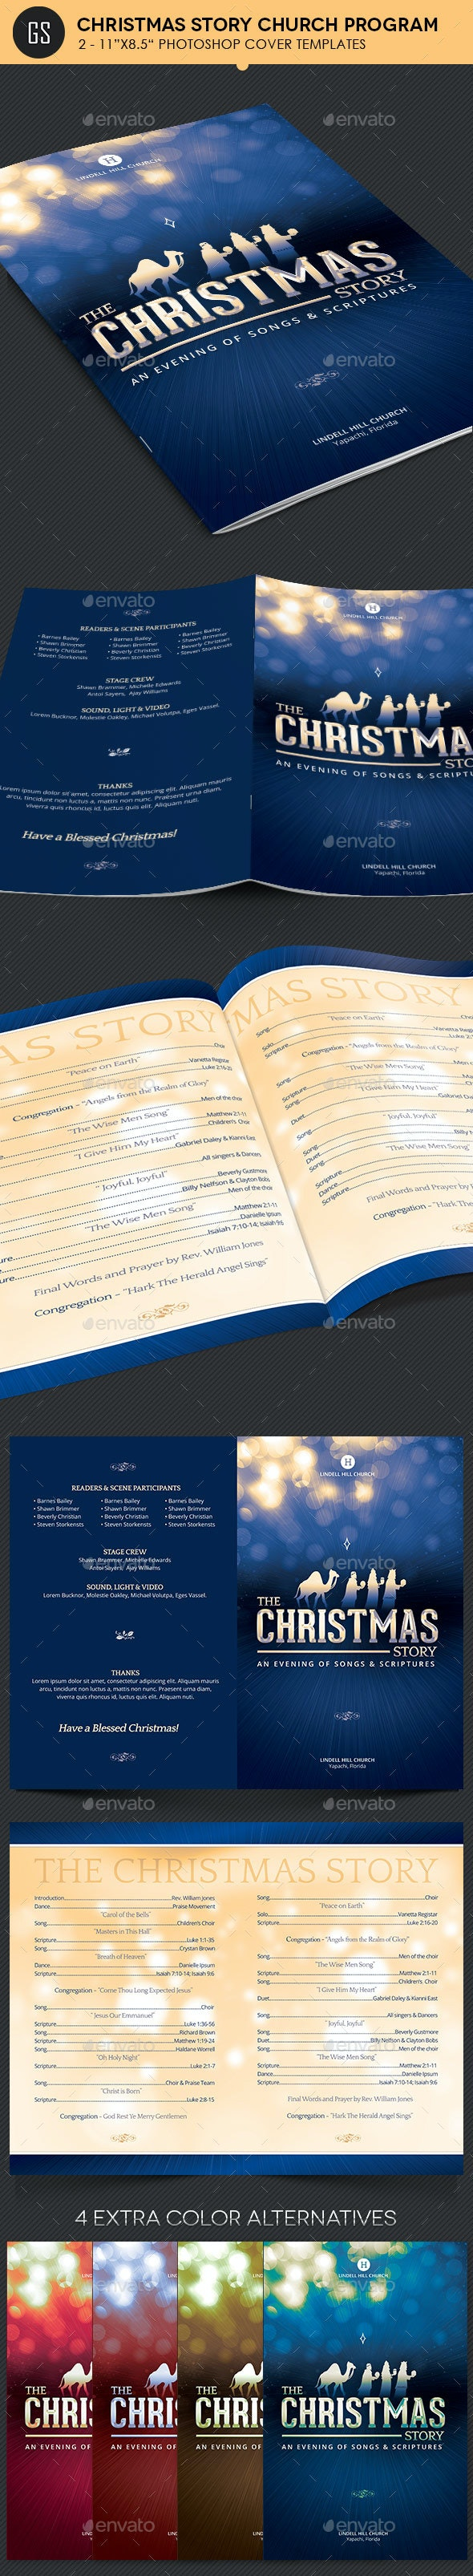 Christmas Story Church Program Template - Informational Brochures